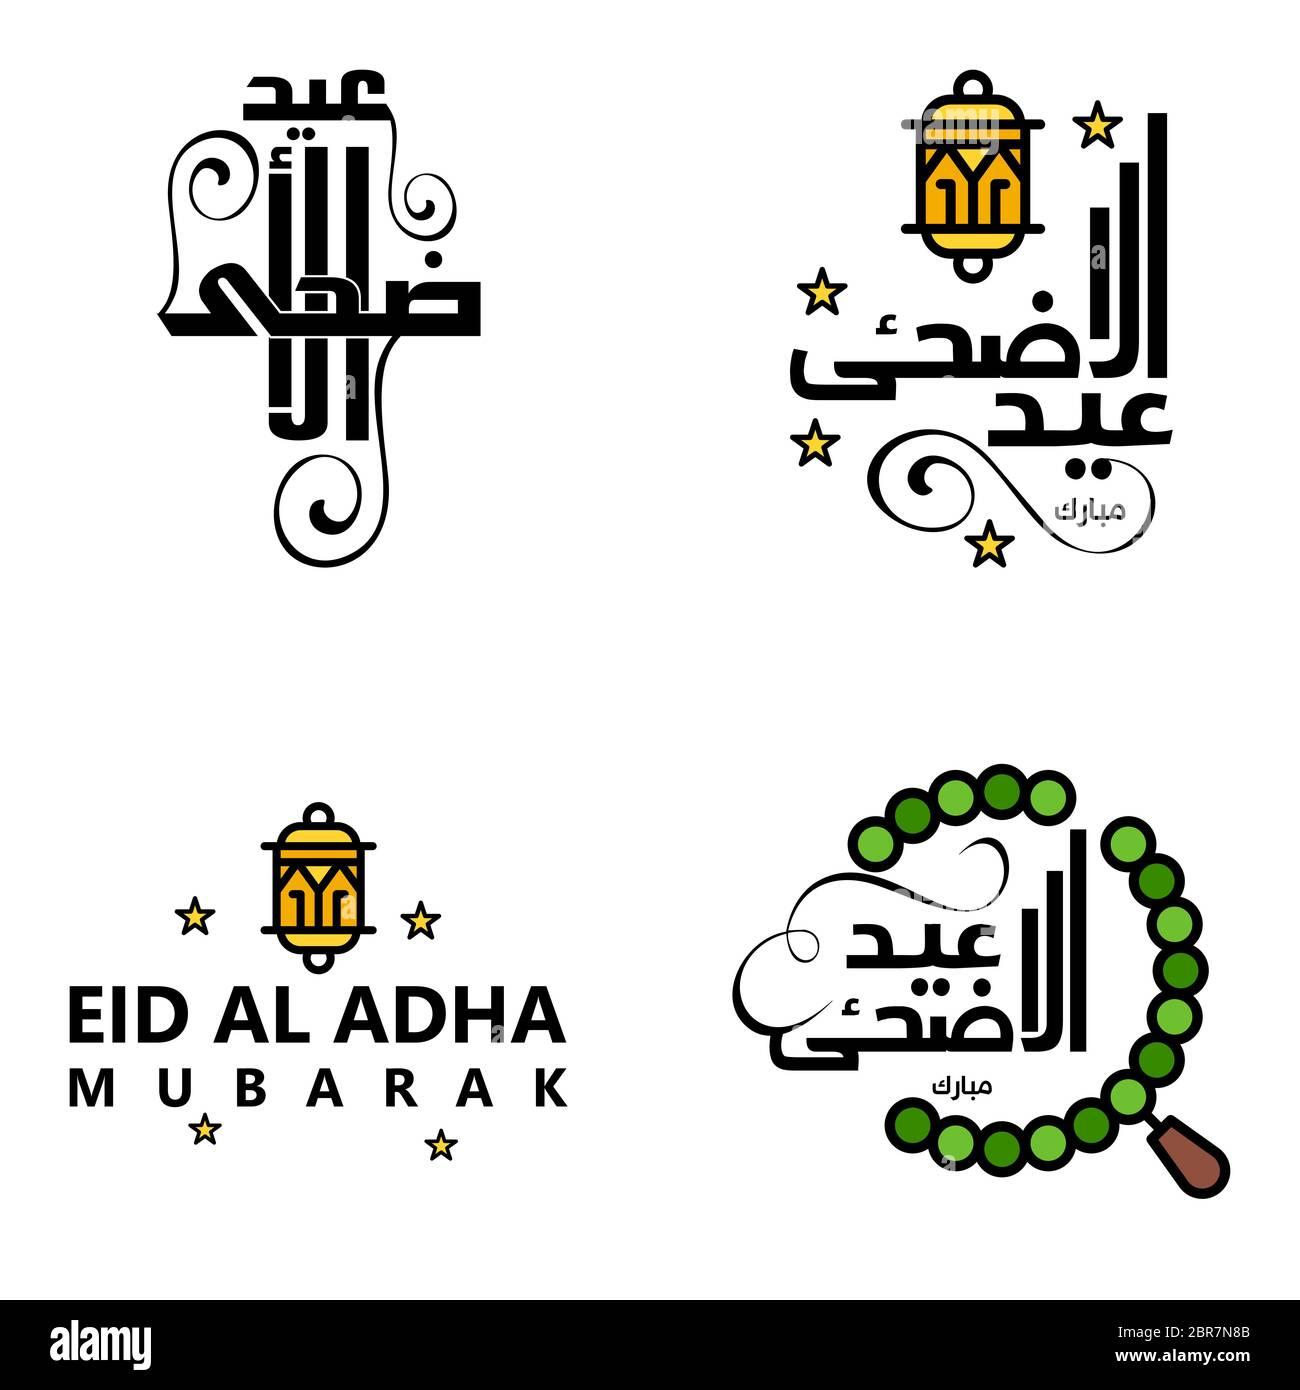 Happy Eid Mubarak Selamat Hari Raya Idul Fitri Eid Al Fitr Vector Pack Of 4 Illustration Best For Greeting Cards Poster And Banners Stock Vector Image Art Alamy